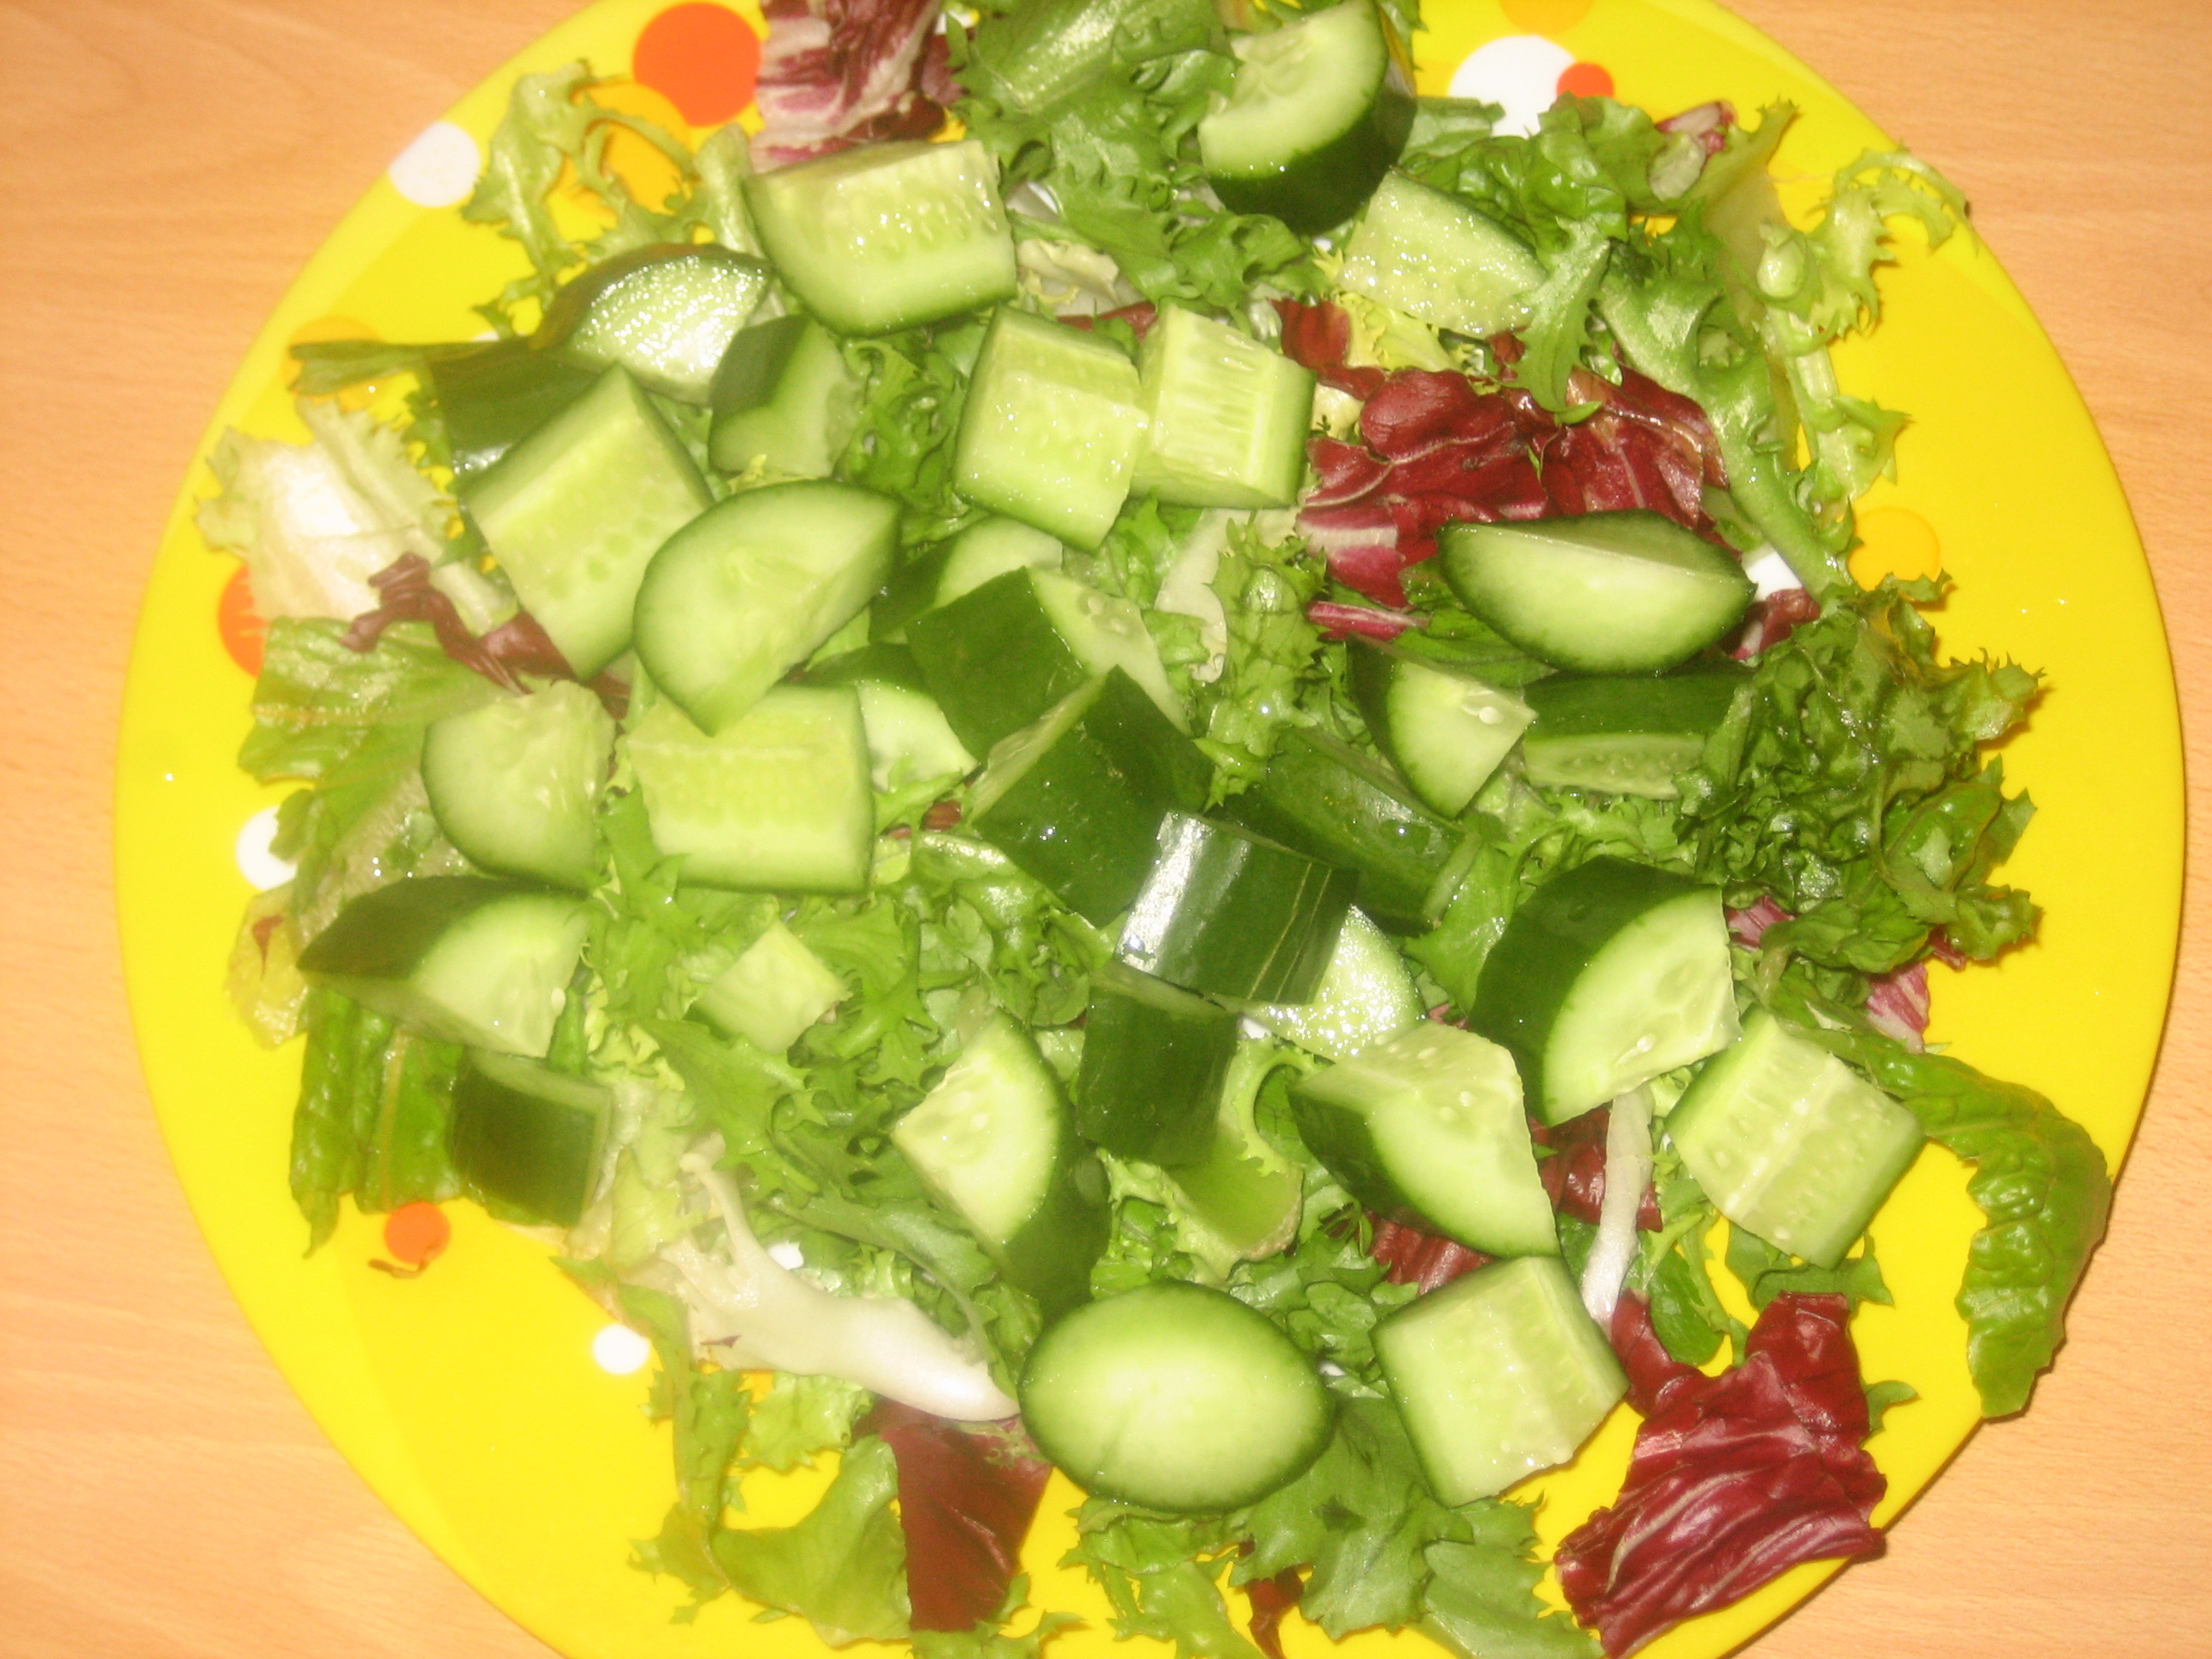 салат греческий рецепт с фото с брынзой и оливками